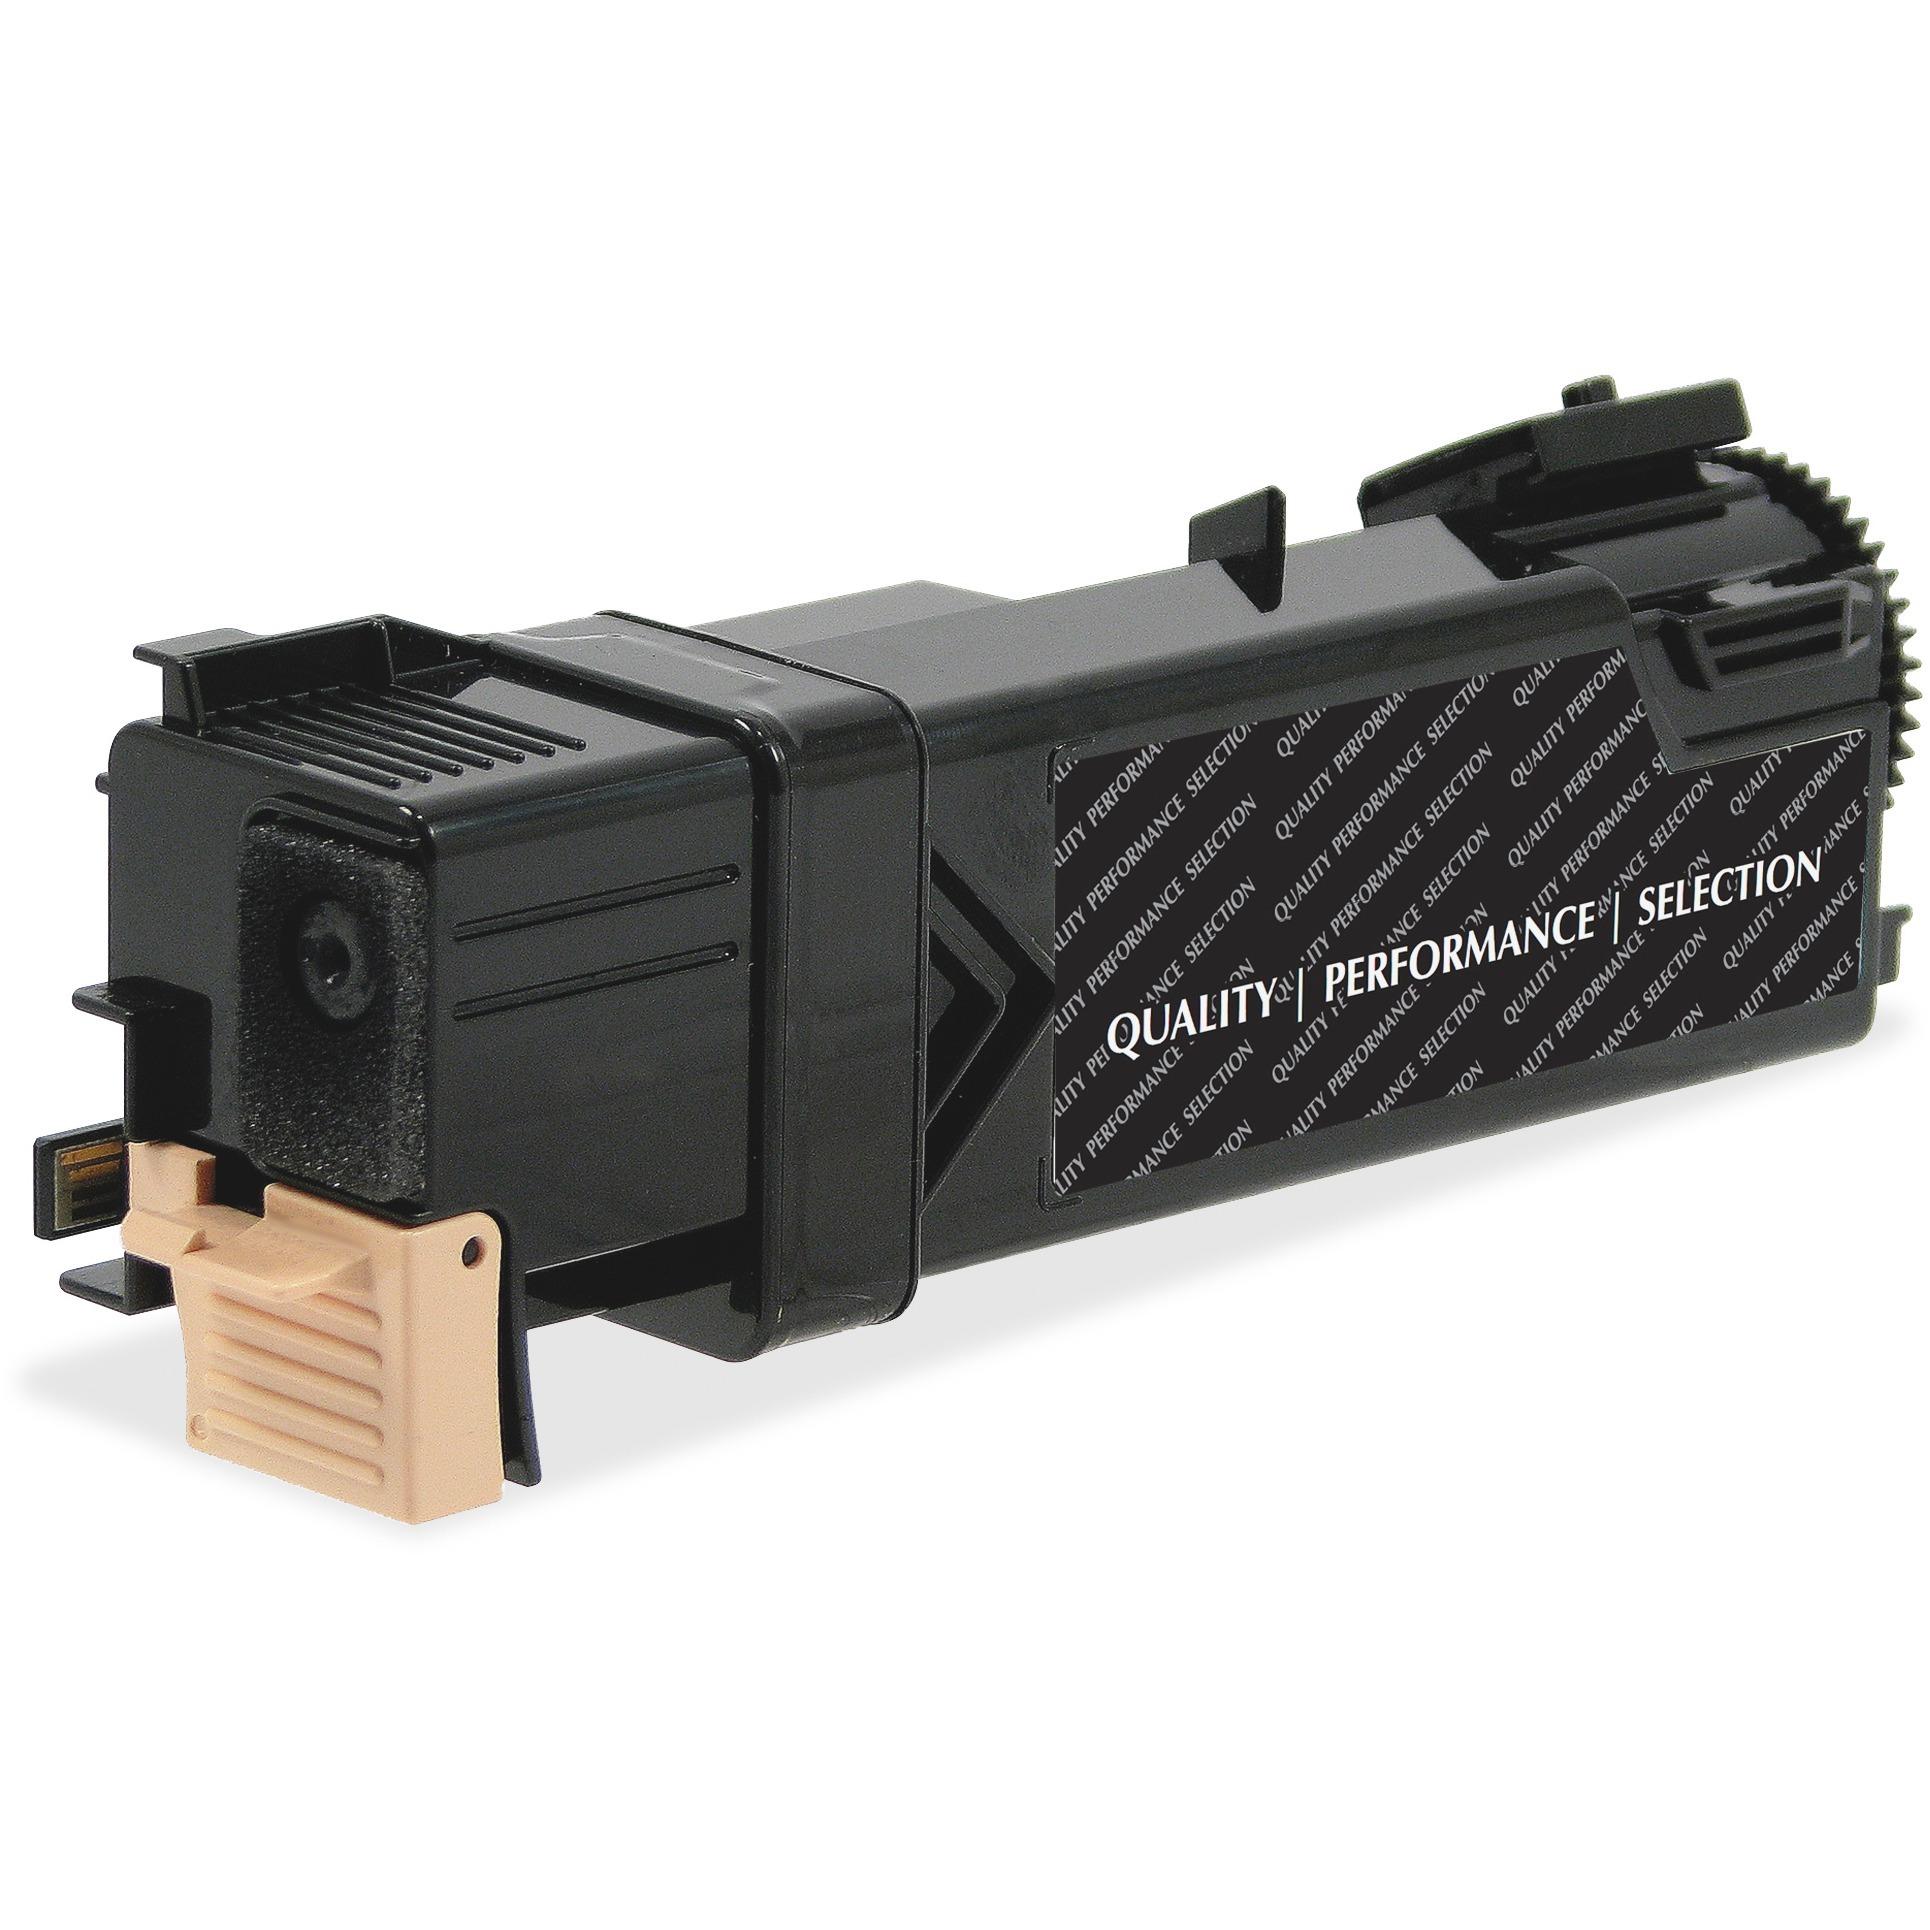 Elite Image, ELI75958, Replacement Dell 2150 Toner Cartridge, 1 Each